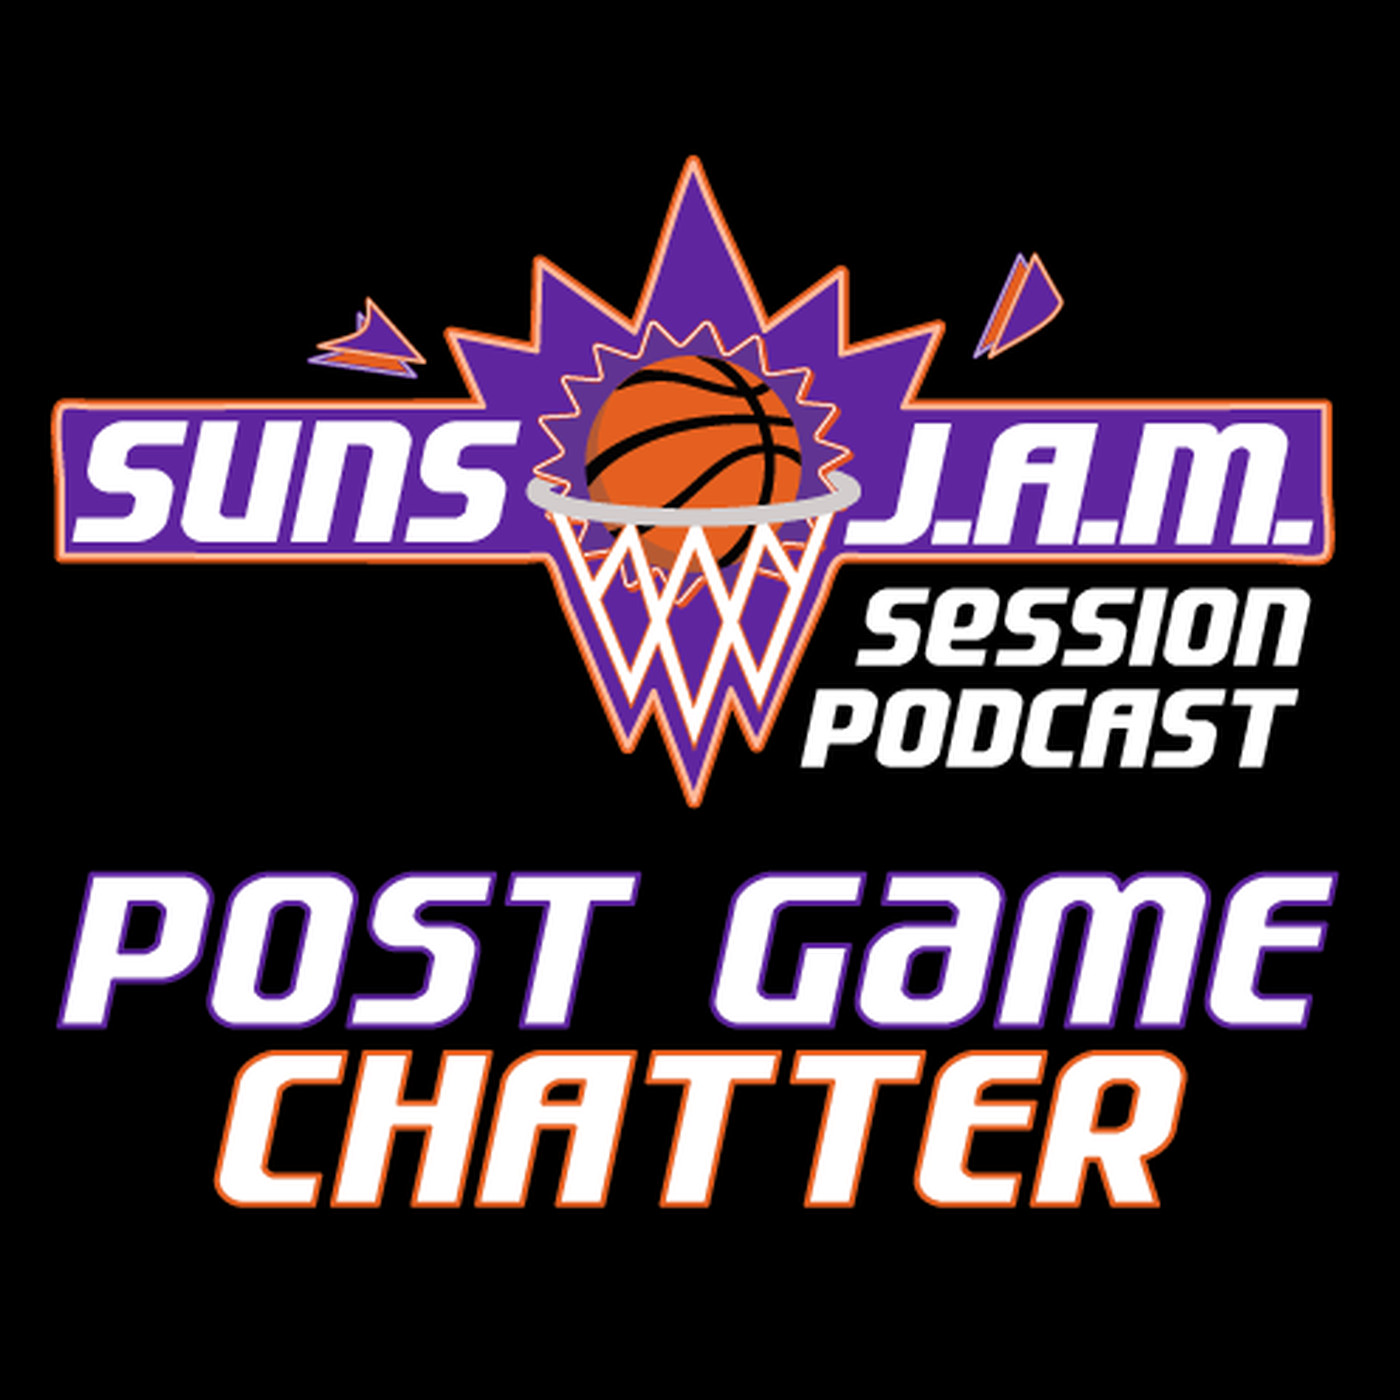 Suns JAM Session Podcast: Suns (14-9 ...